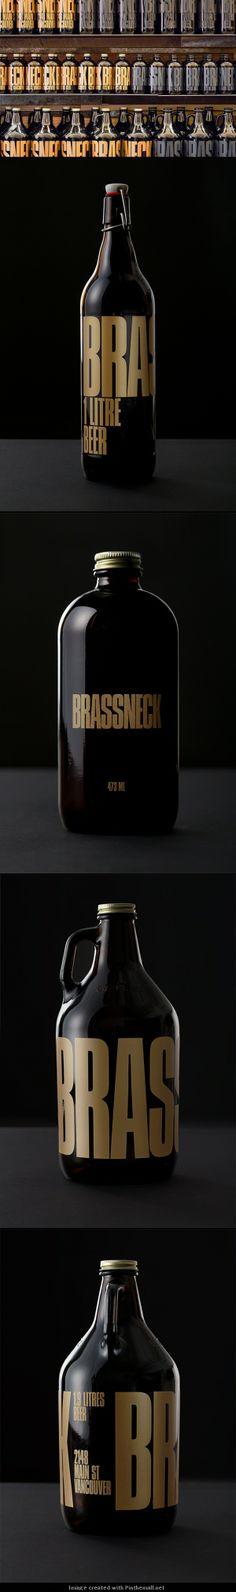 Brassneck Brewery #beer #maximum #taninotanino